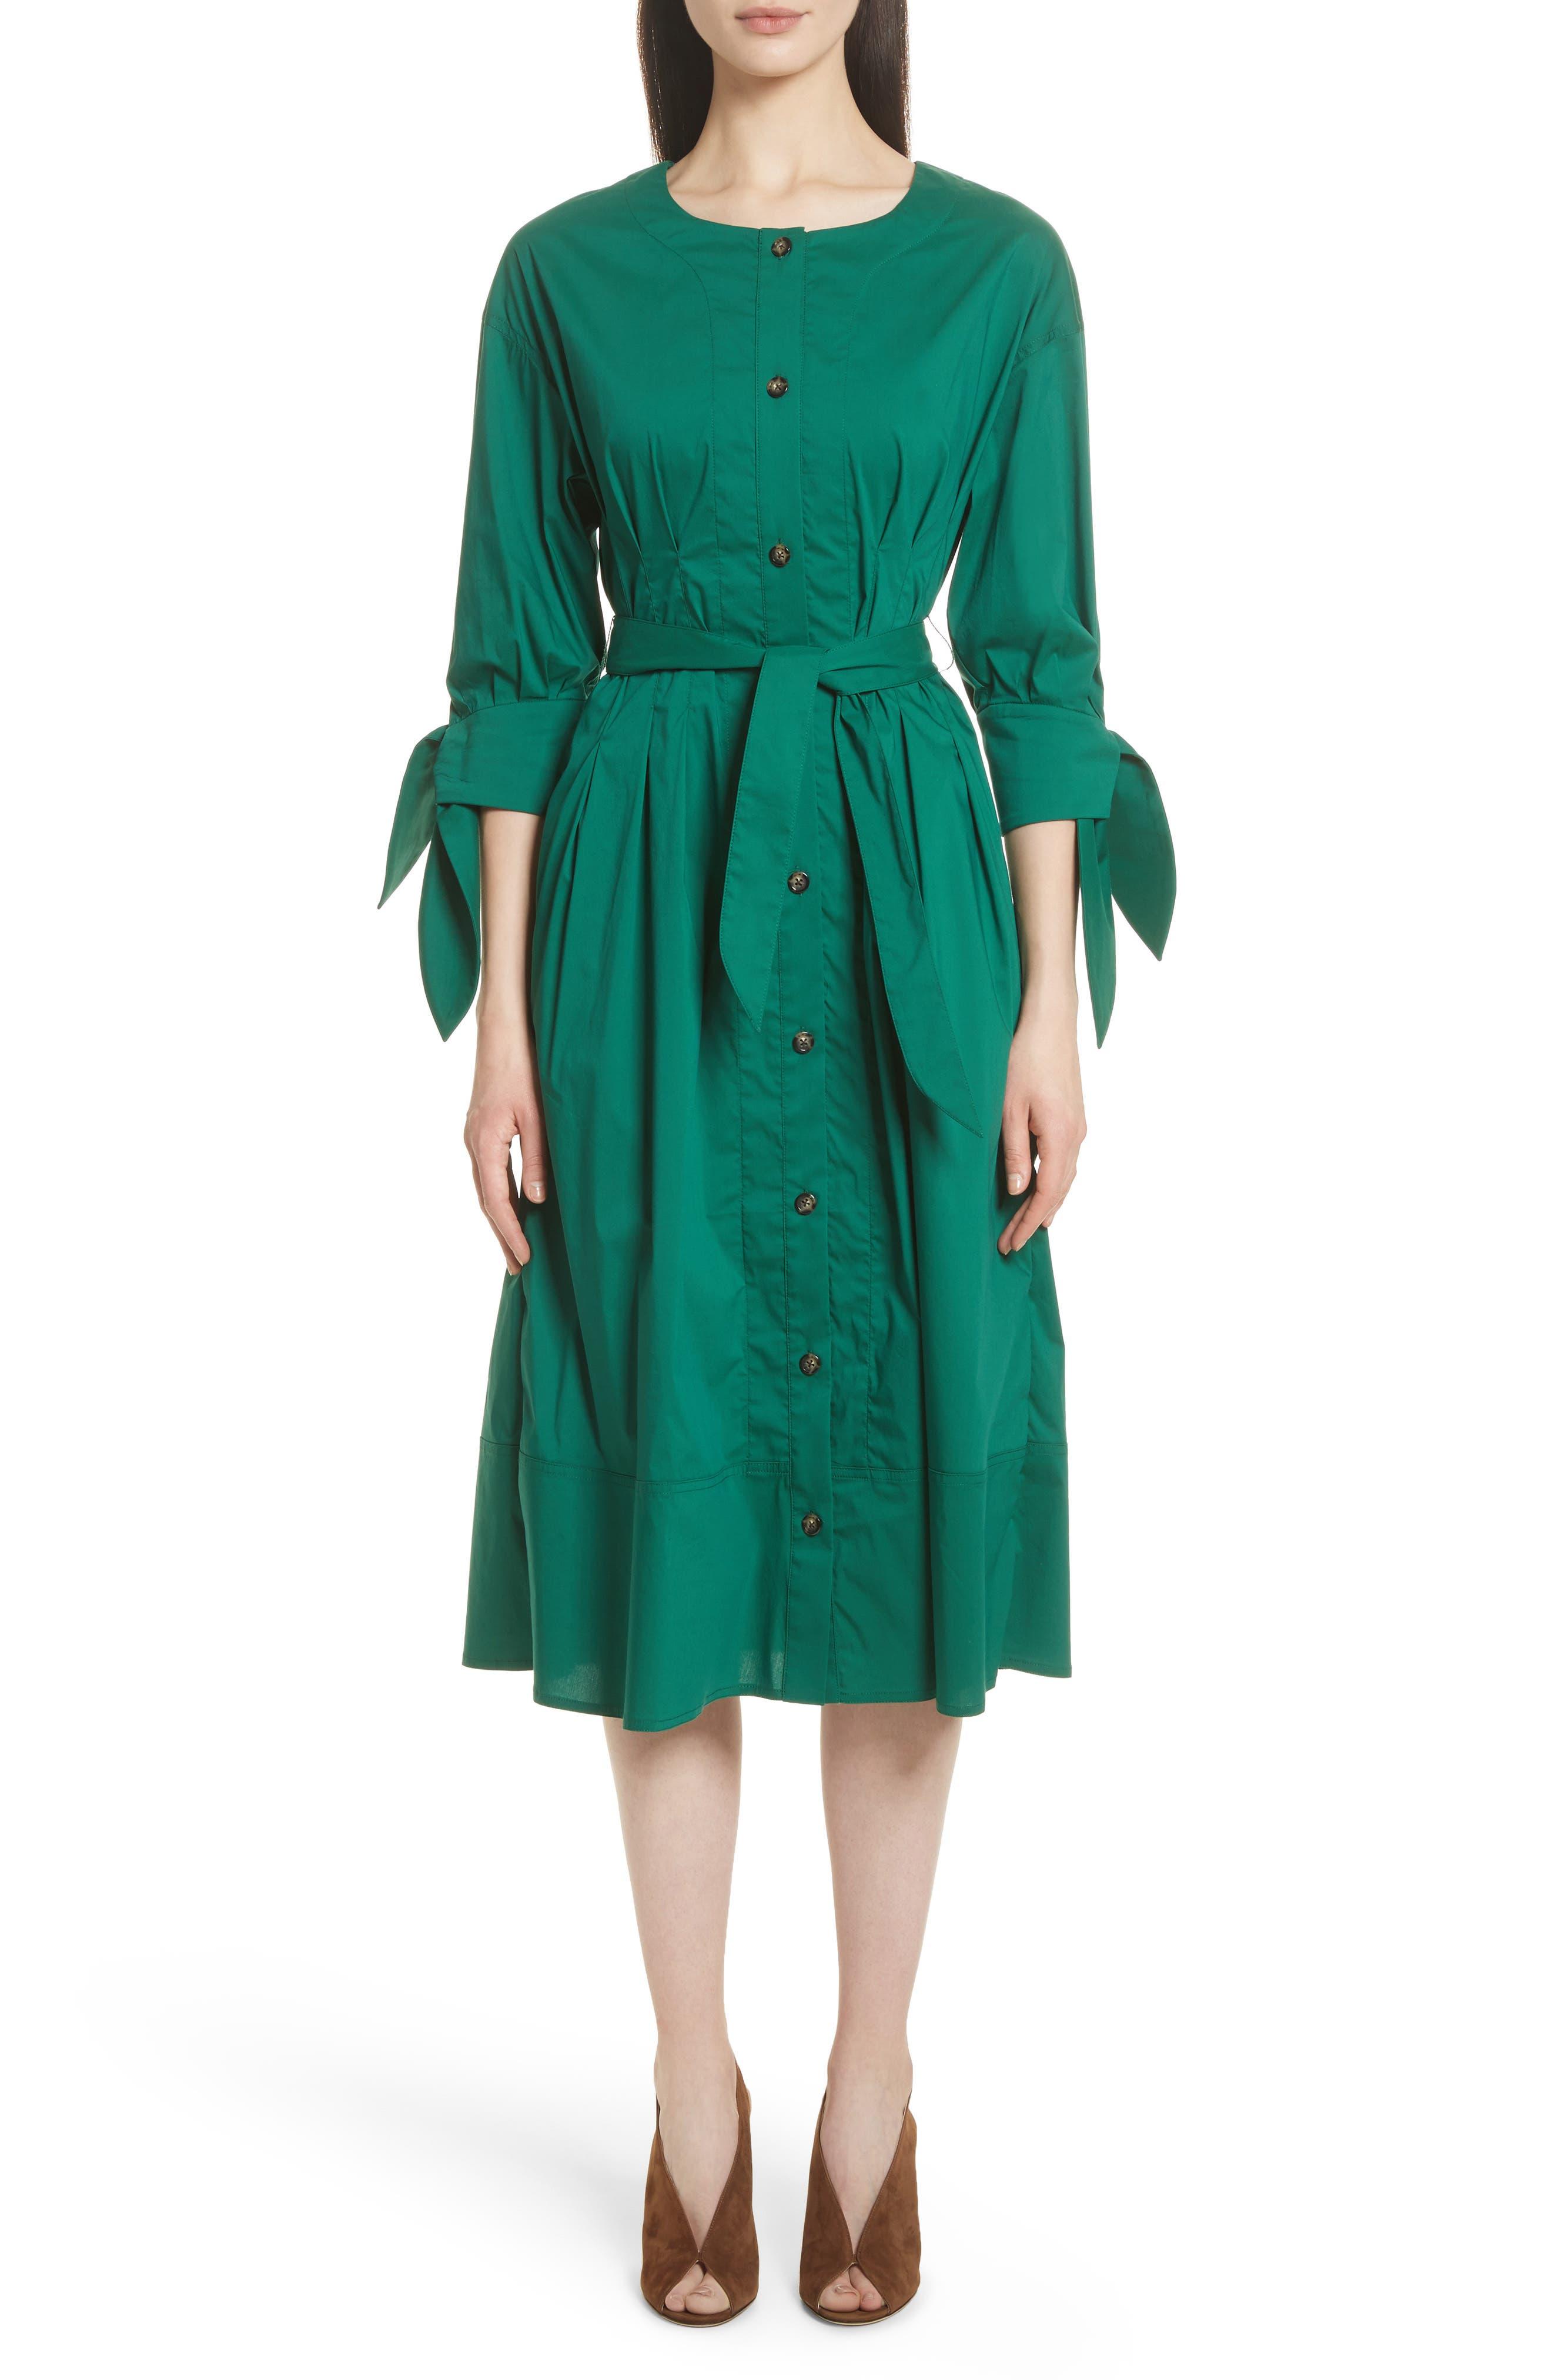 GREY Jason Wu Cotton Blend Tie Dress